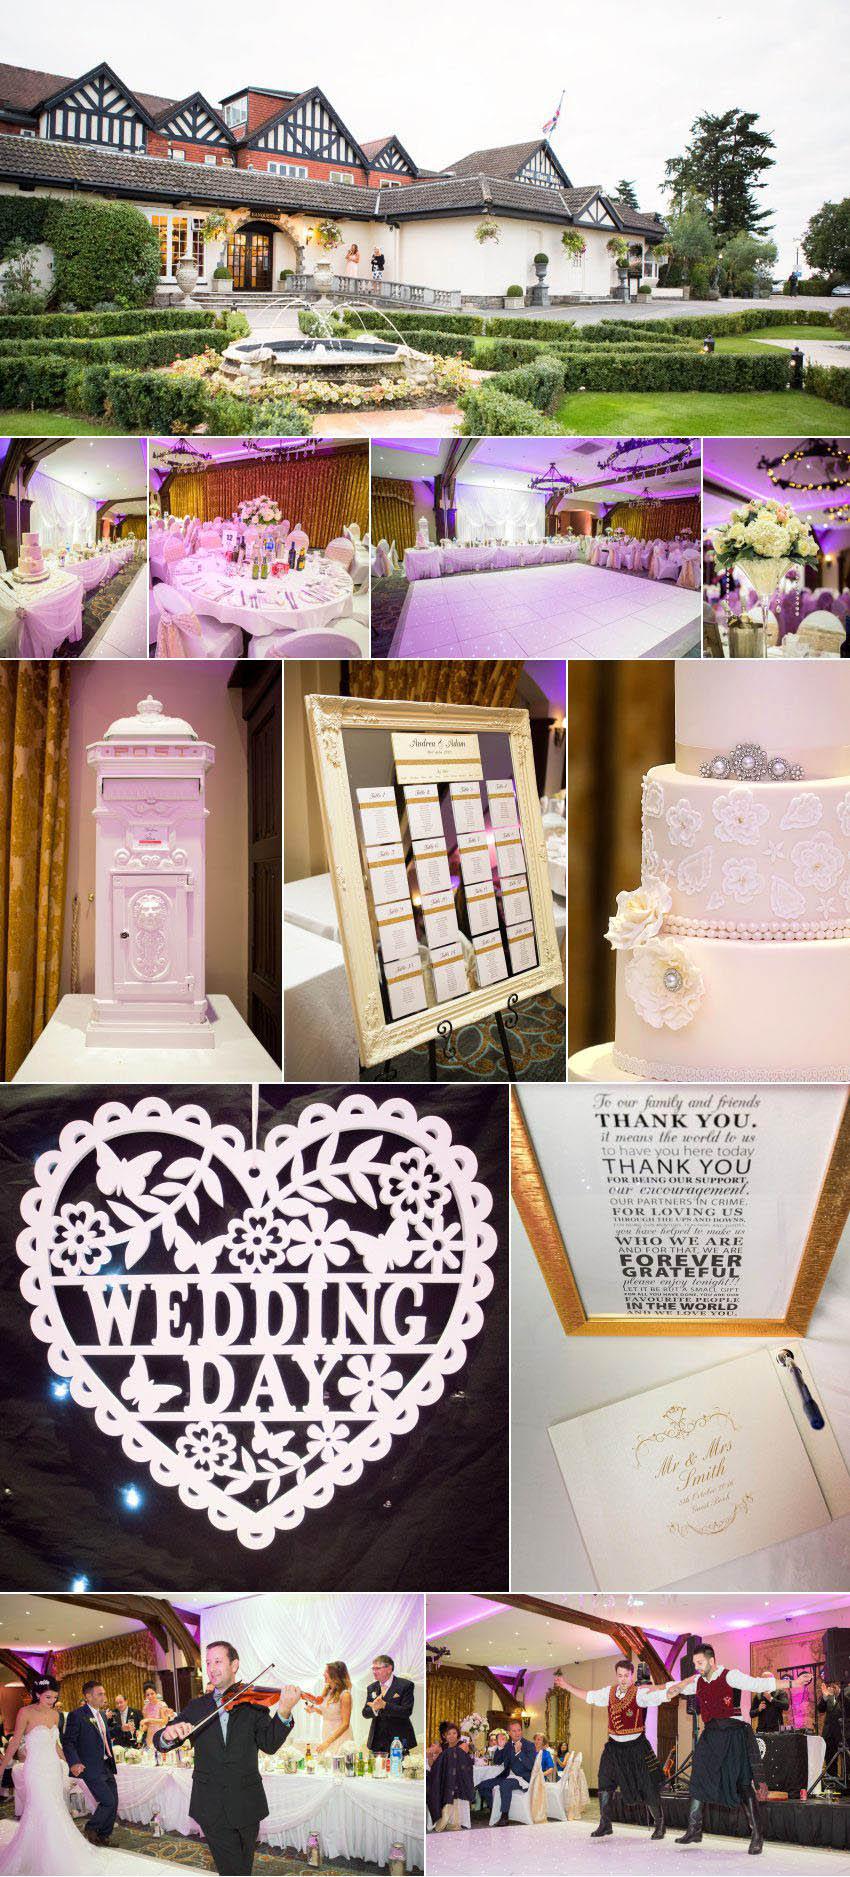 A wedding reception at Royal Chase venue 13